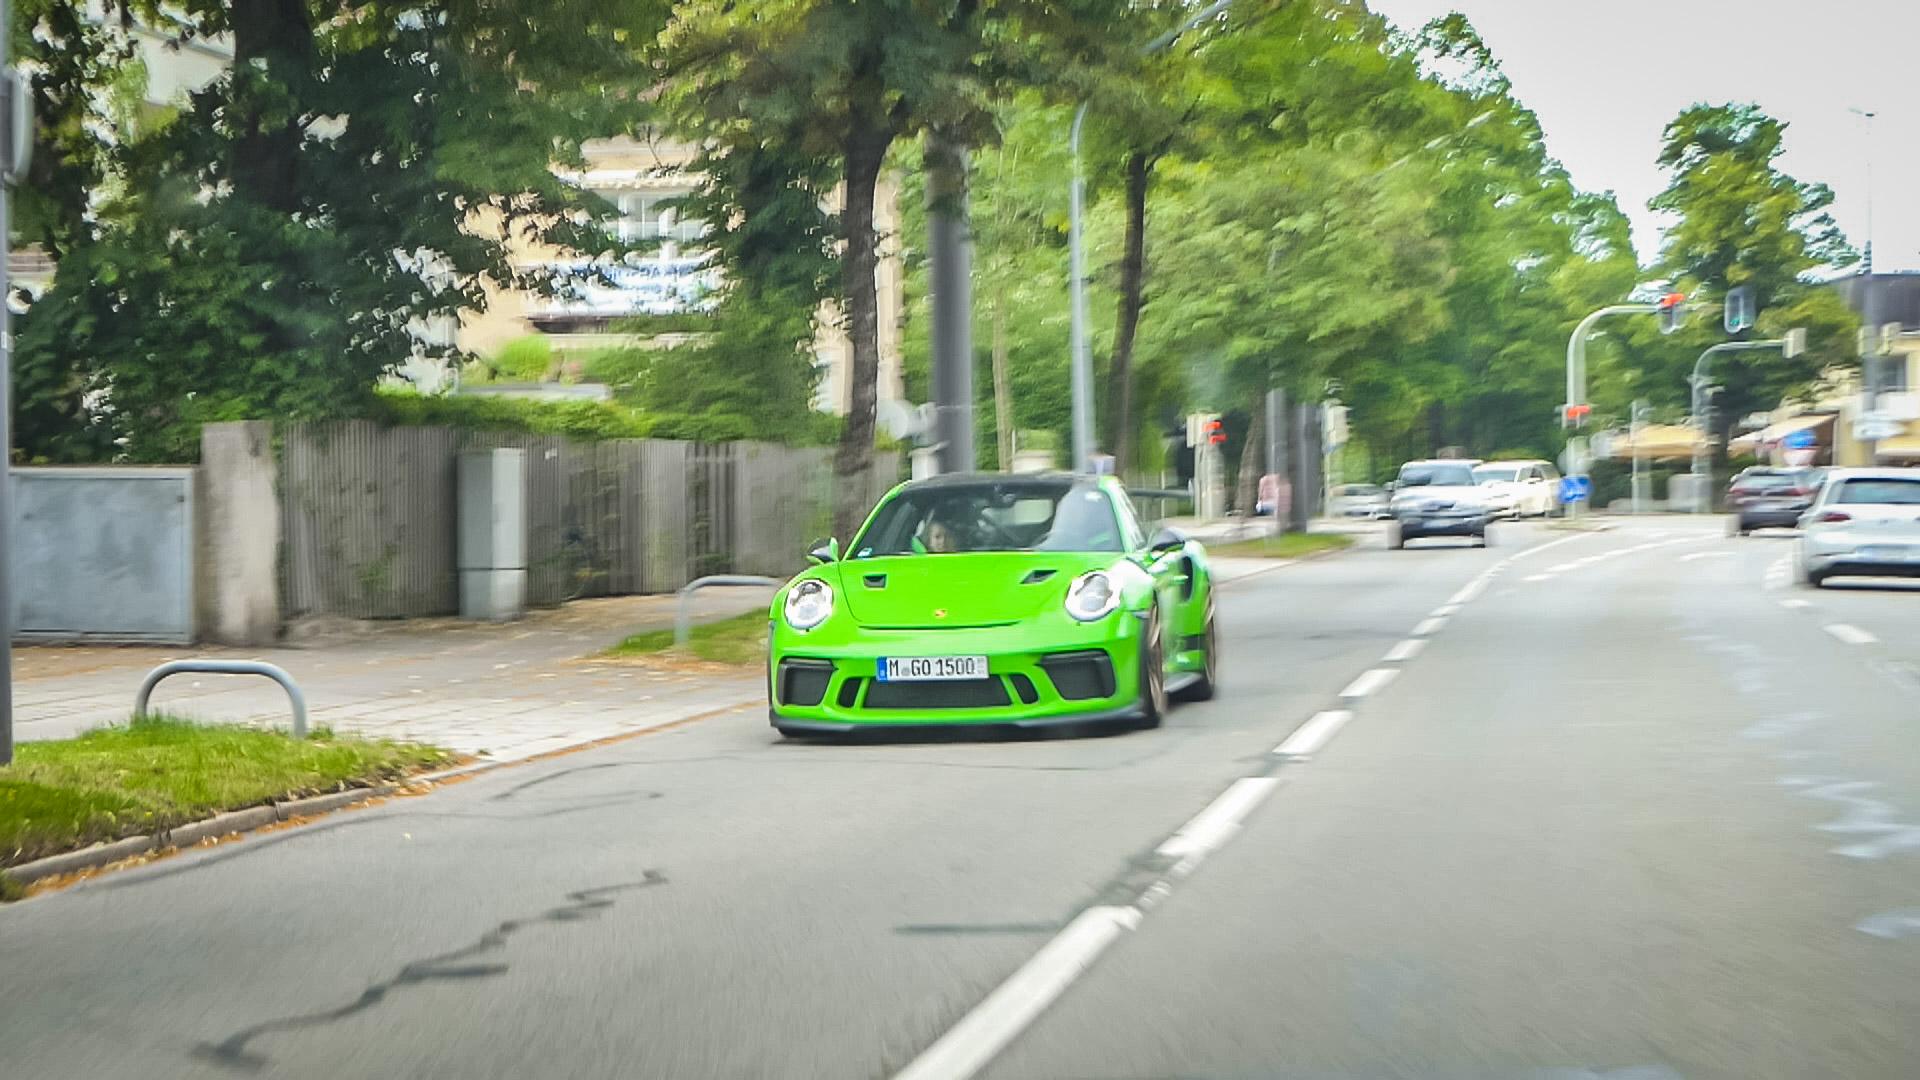 Porsche 911 991.2 GT3 RS - M-GO-1500